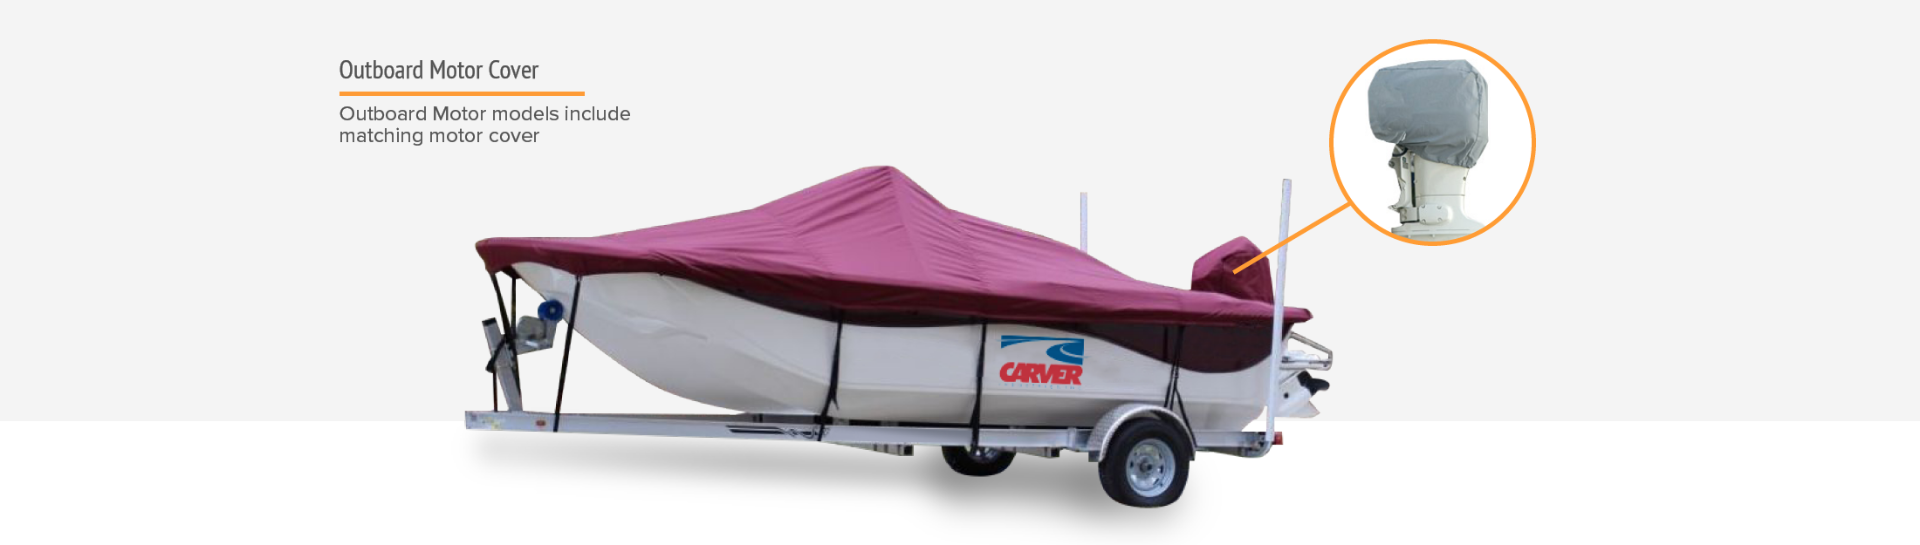 Carver boat cover motor cover